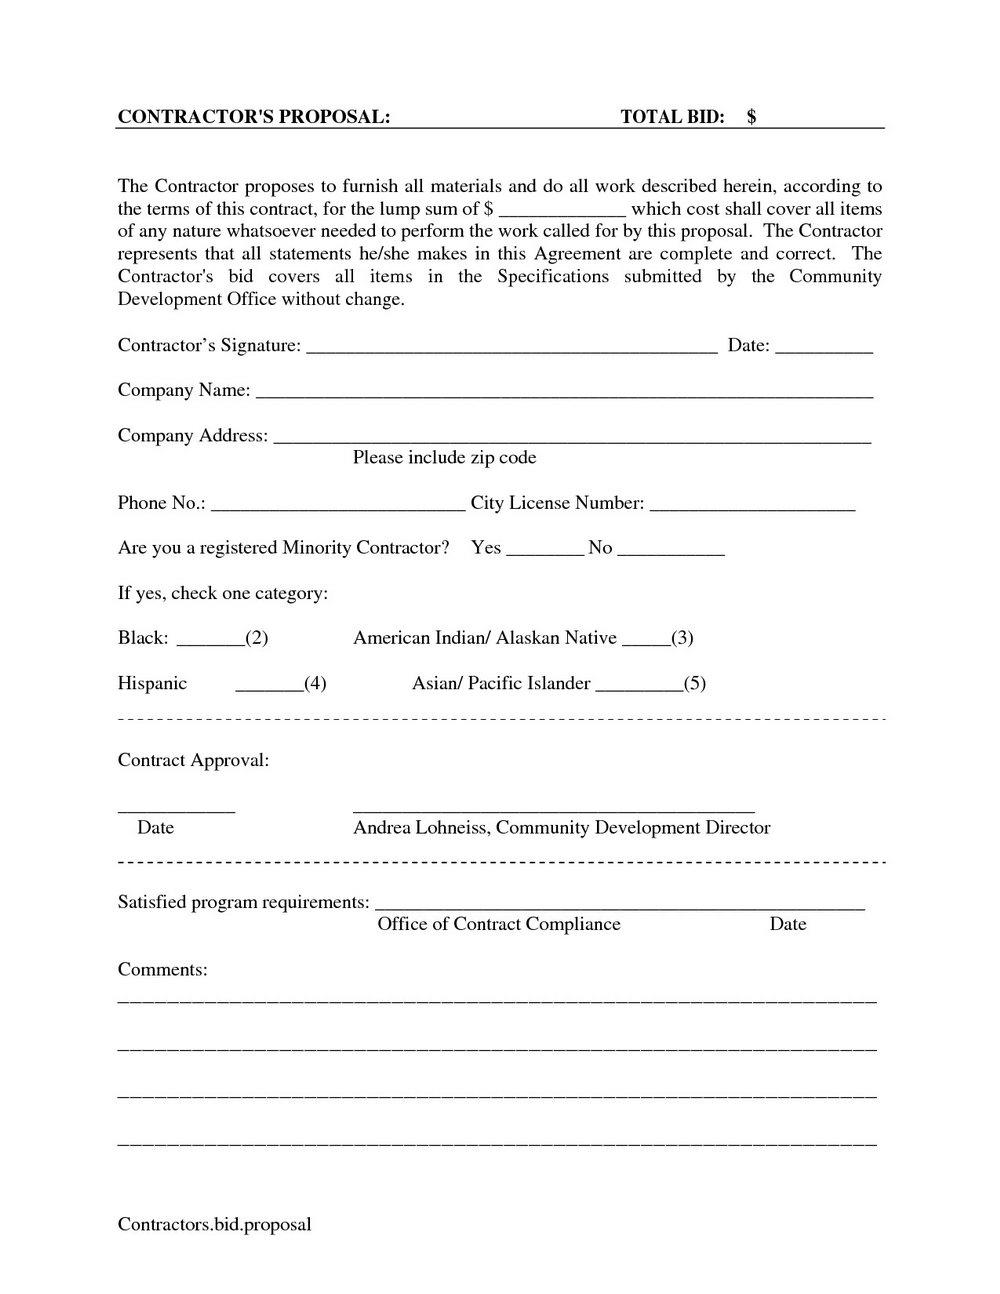 Free Bid Proposal Template